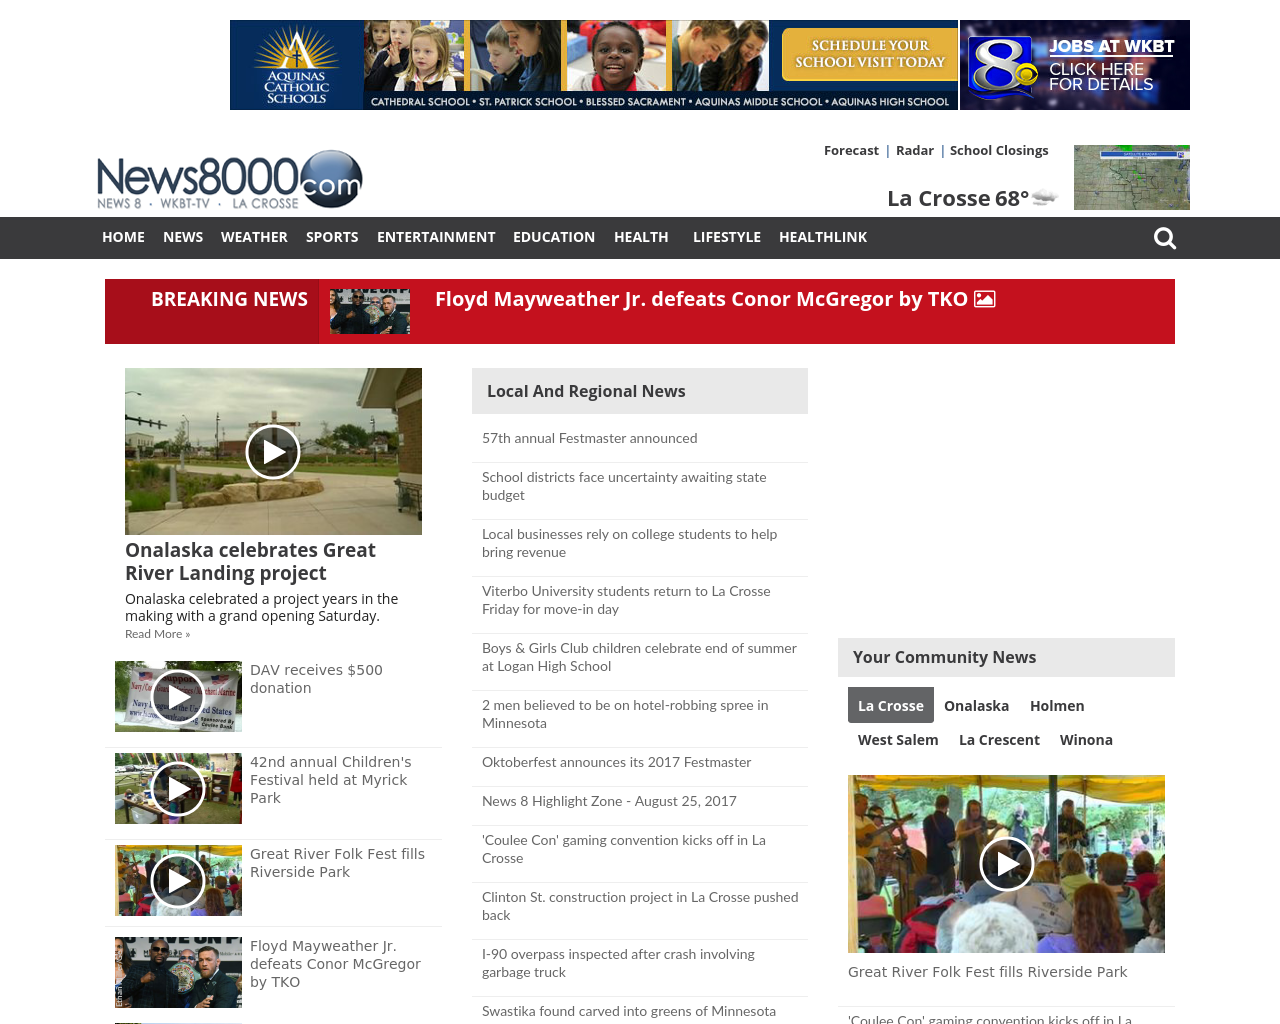 News8000-Advertising-Reviews-Pricing